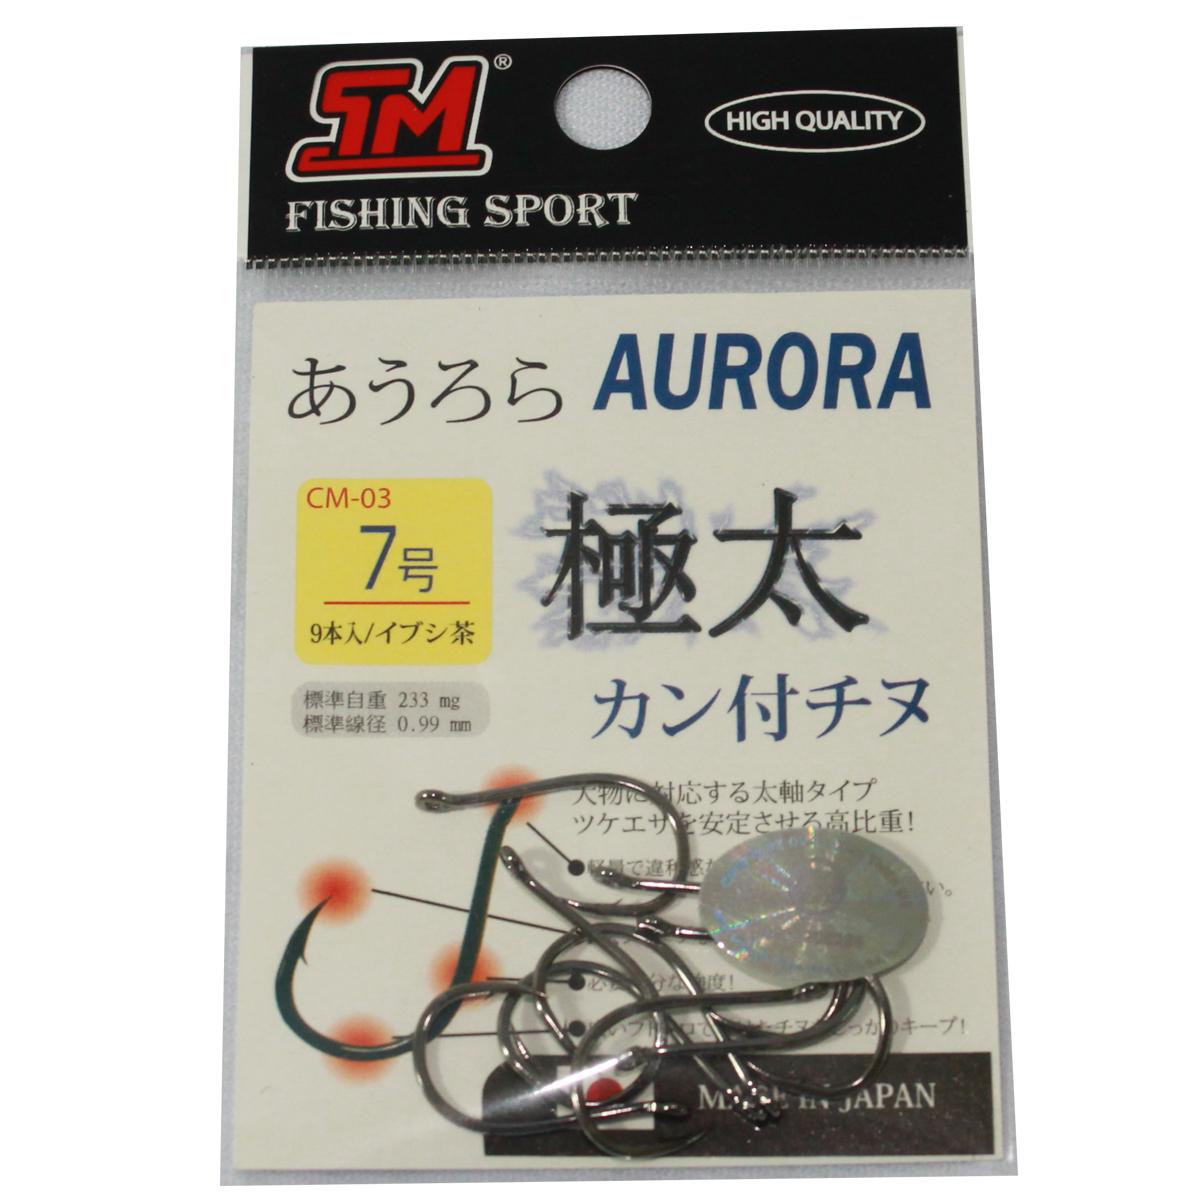 Phụ Kiện Câu Cá -Lưỡi Câu Aurora Nhật Bản